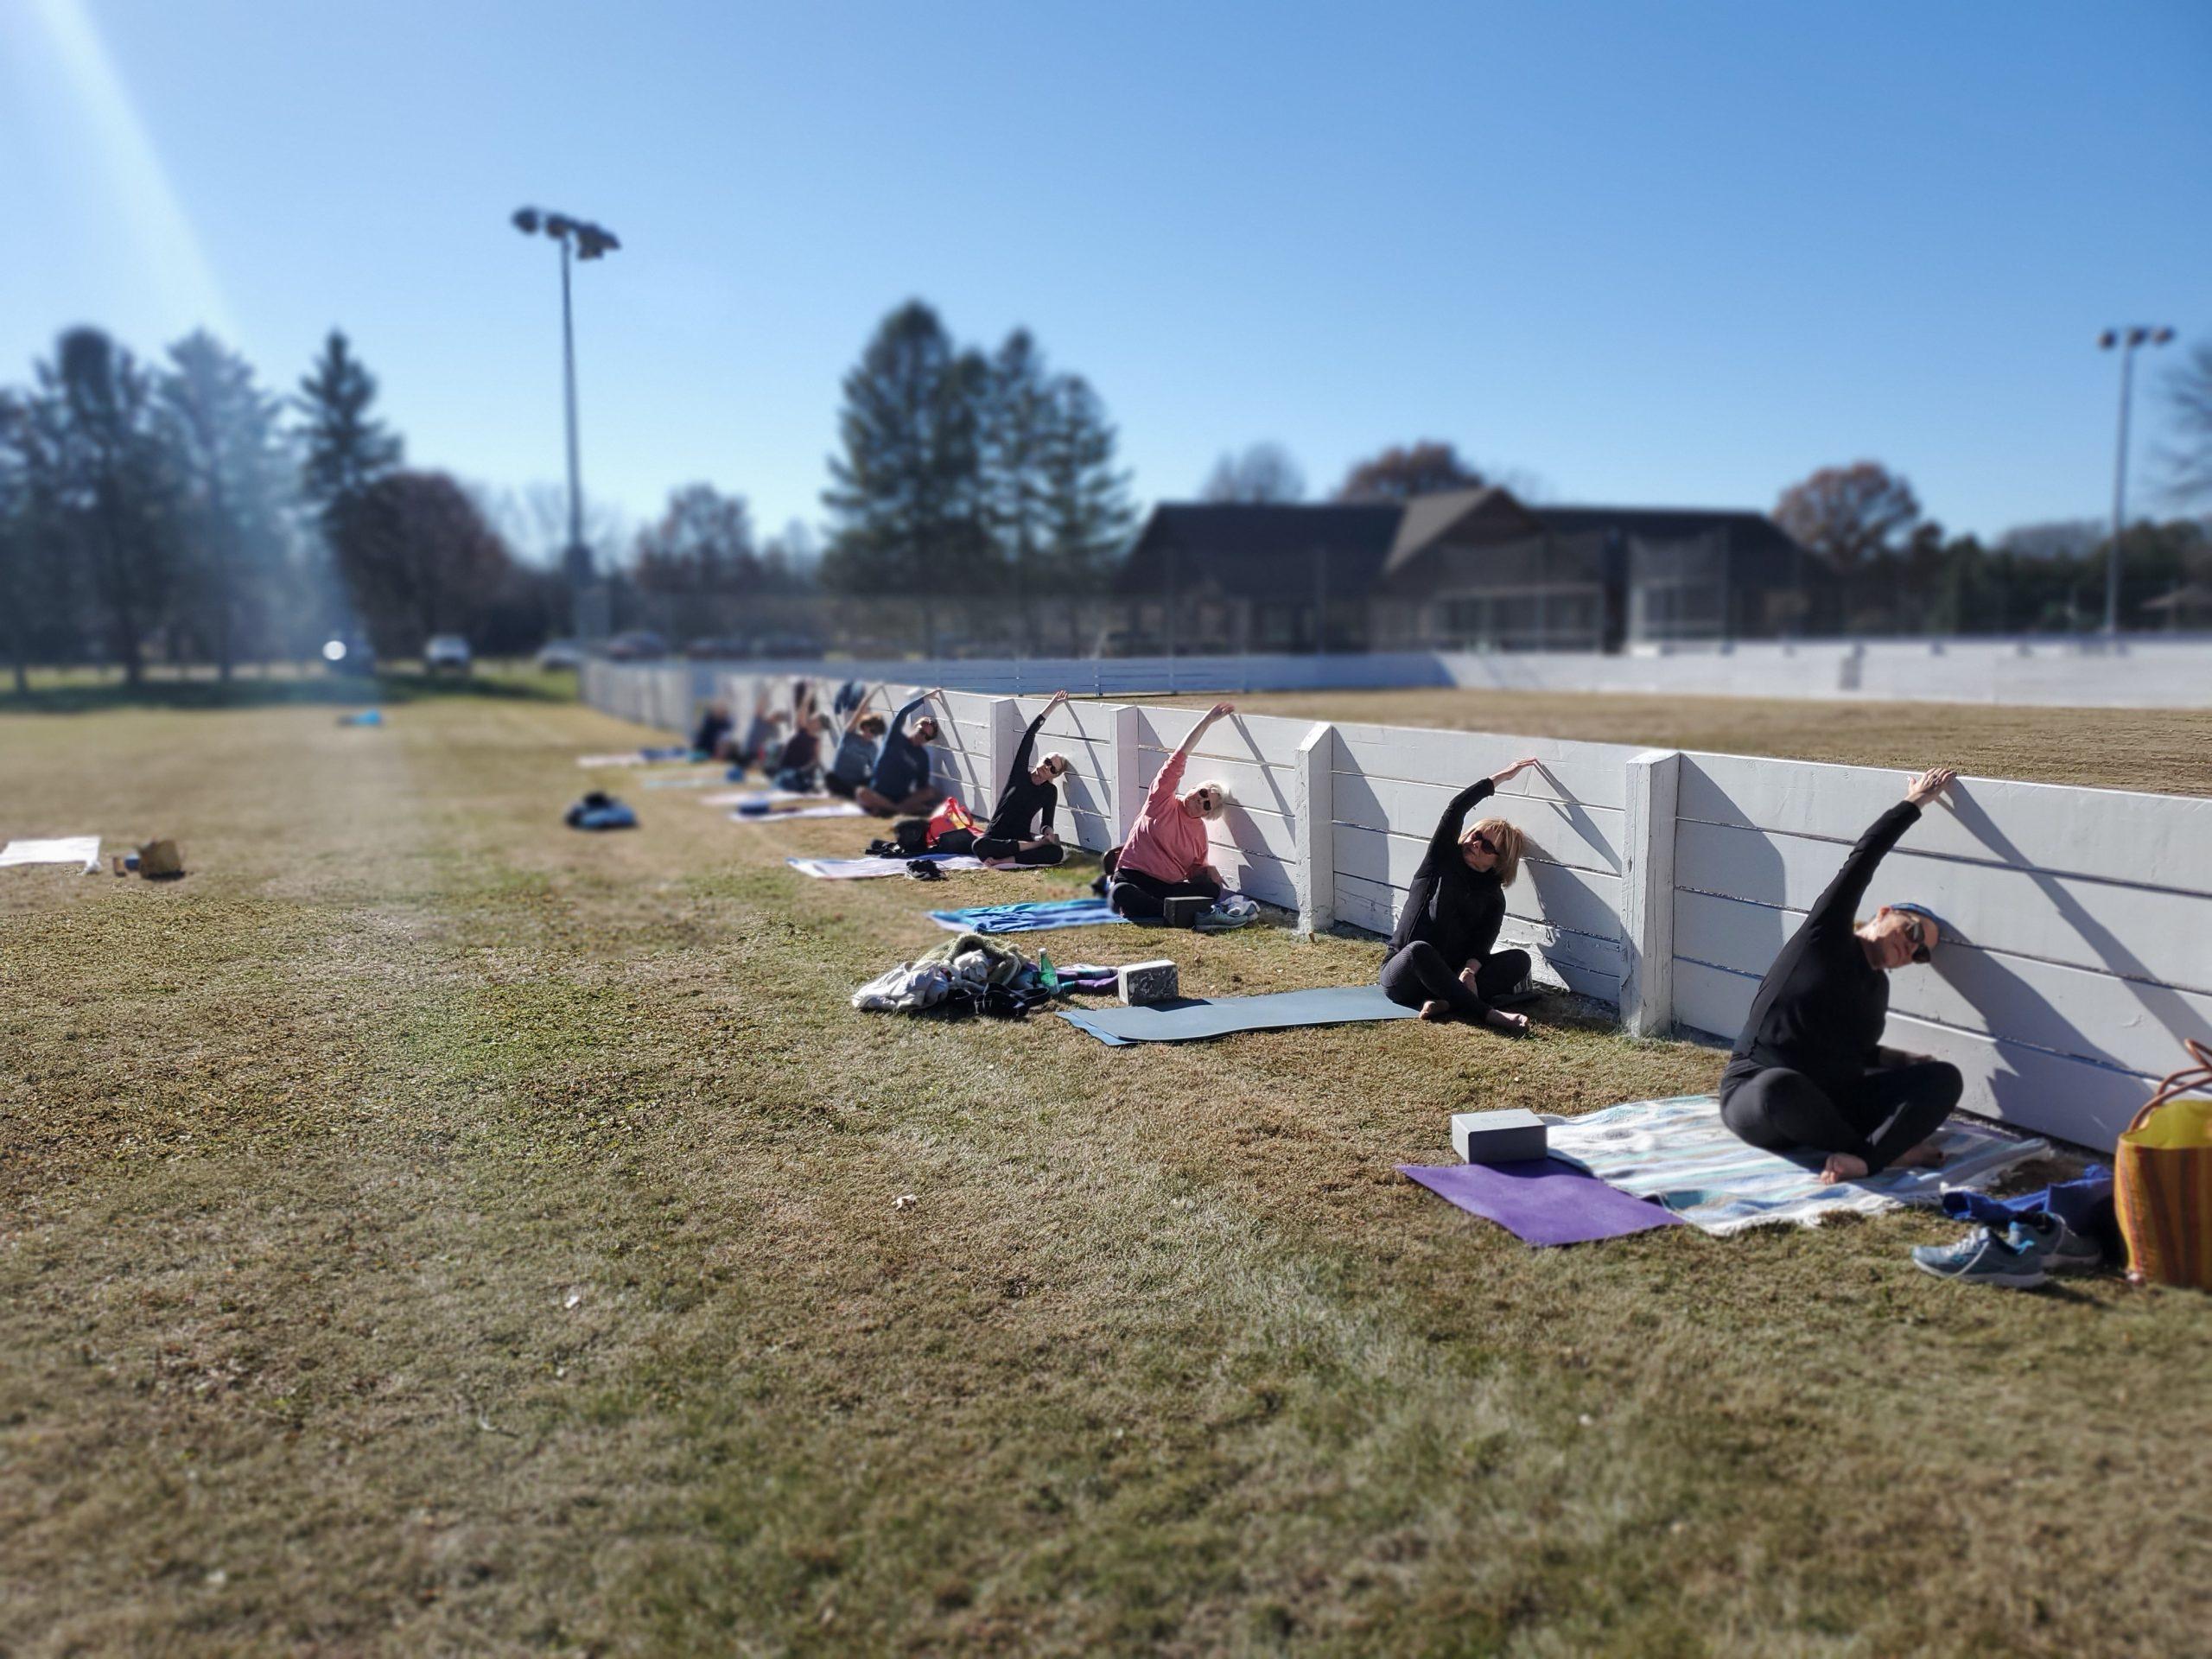 yoga hot dish yoga outside fence stretch